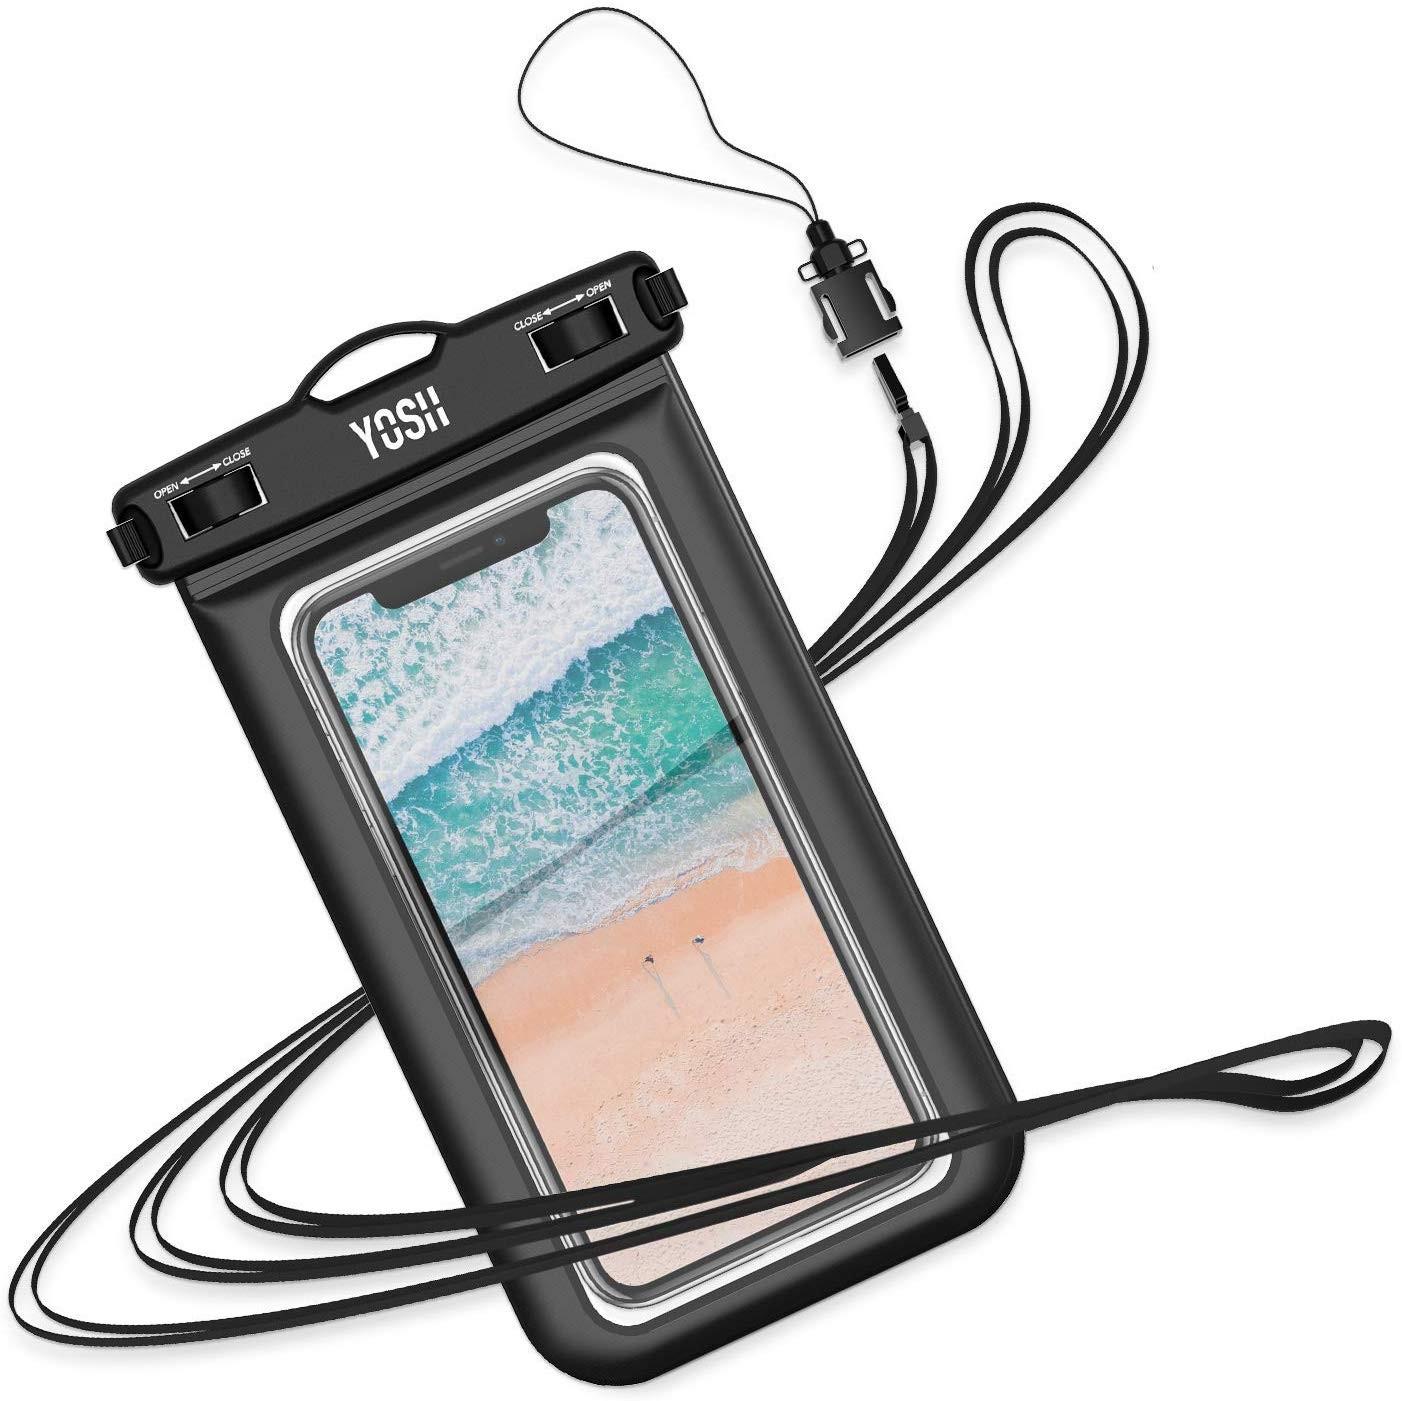 blogging equipment list kit list gear yosh pouch